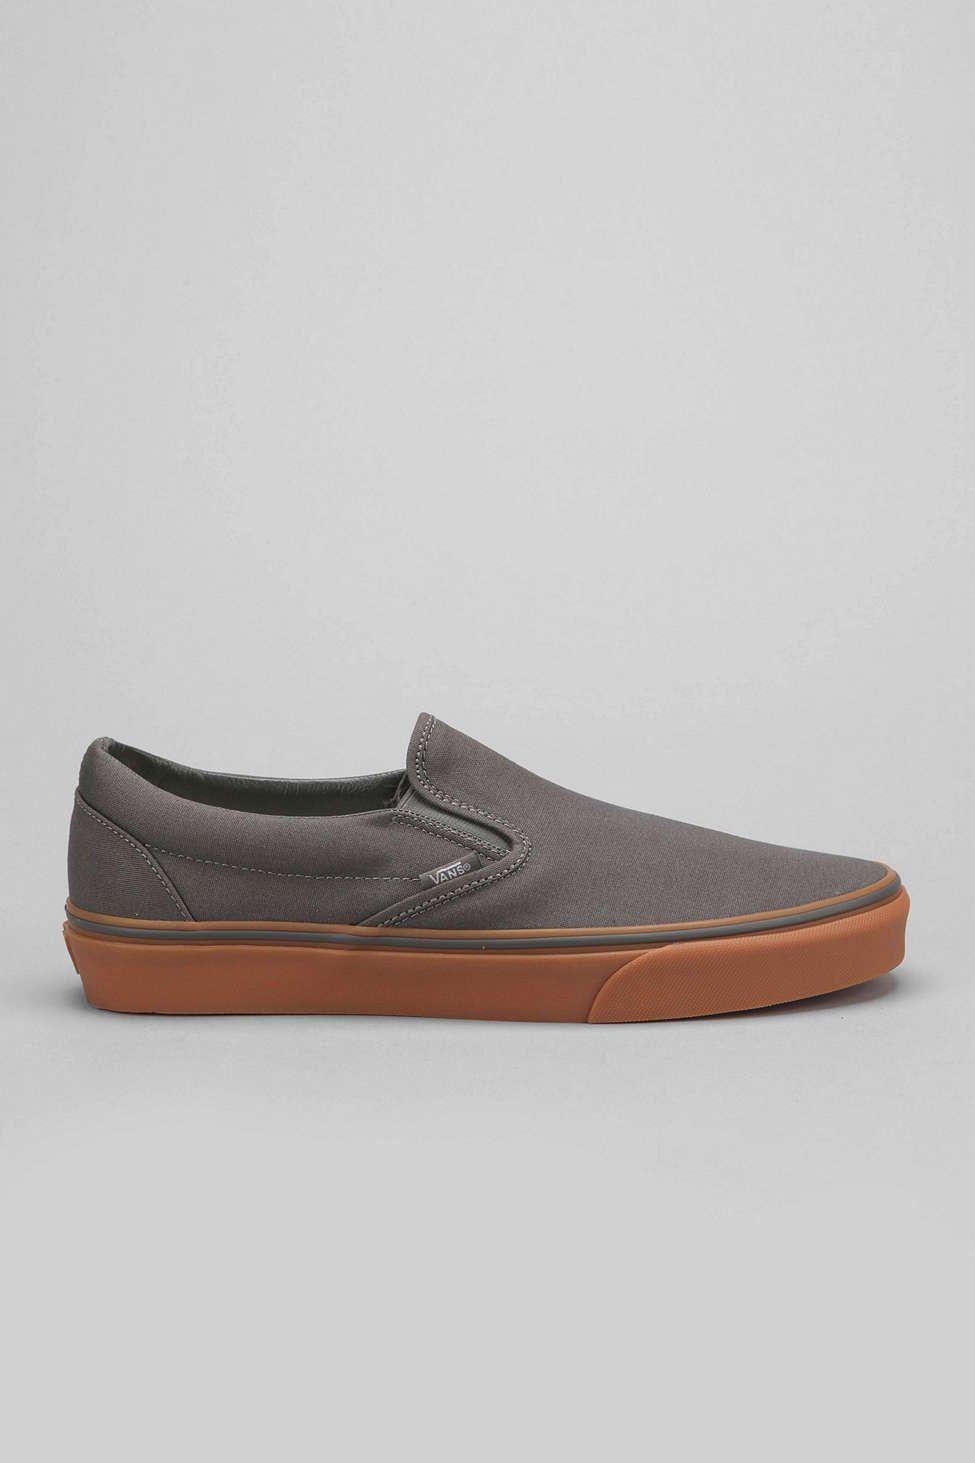 dd9bcb4c89 Vans Classic Gum-Sole Slip-On Mens Sneaker - Urban Outfitters sz 14 ...